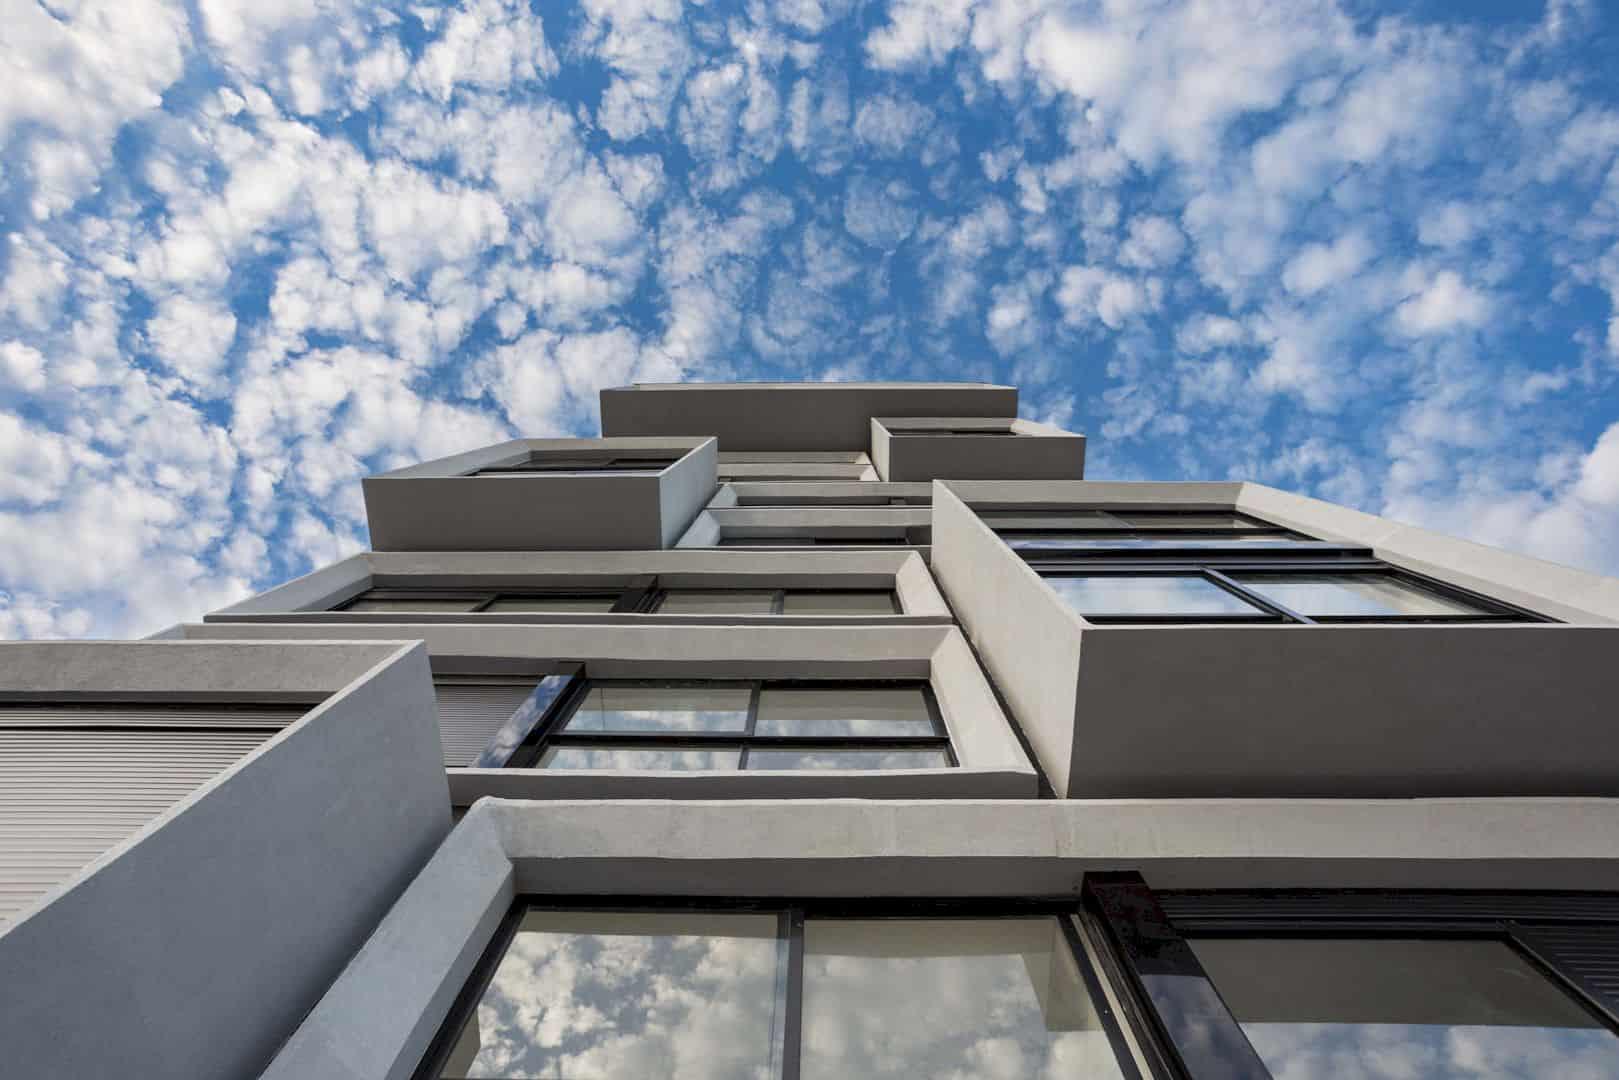 Fernando Abbott 866 A High Rise Residential Building In Porto Alegre 7